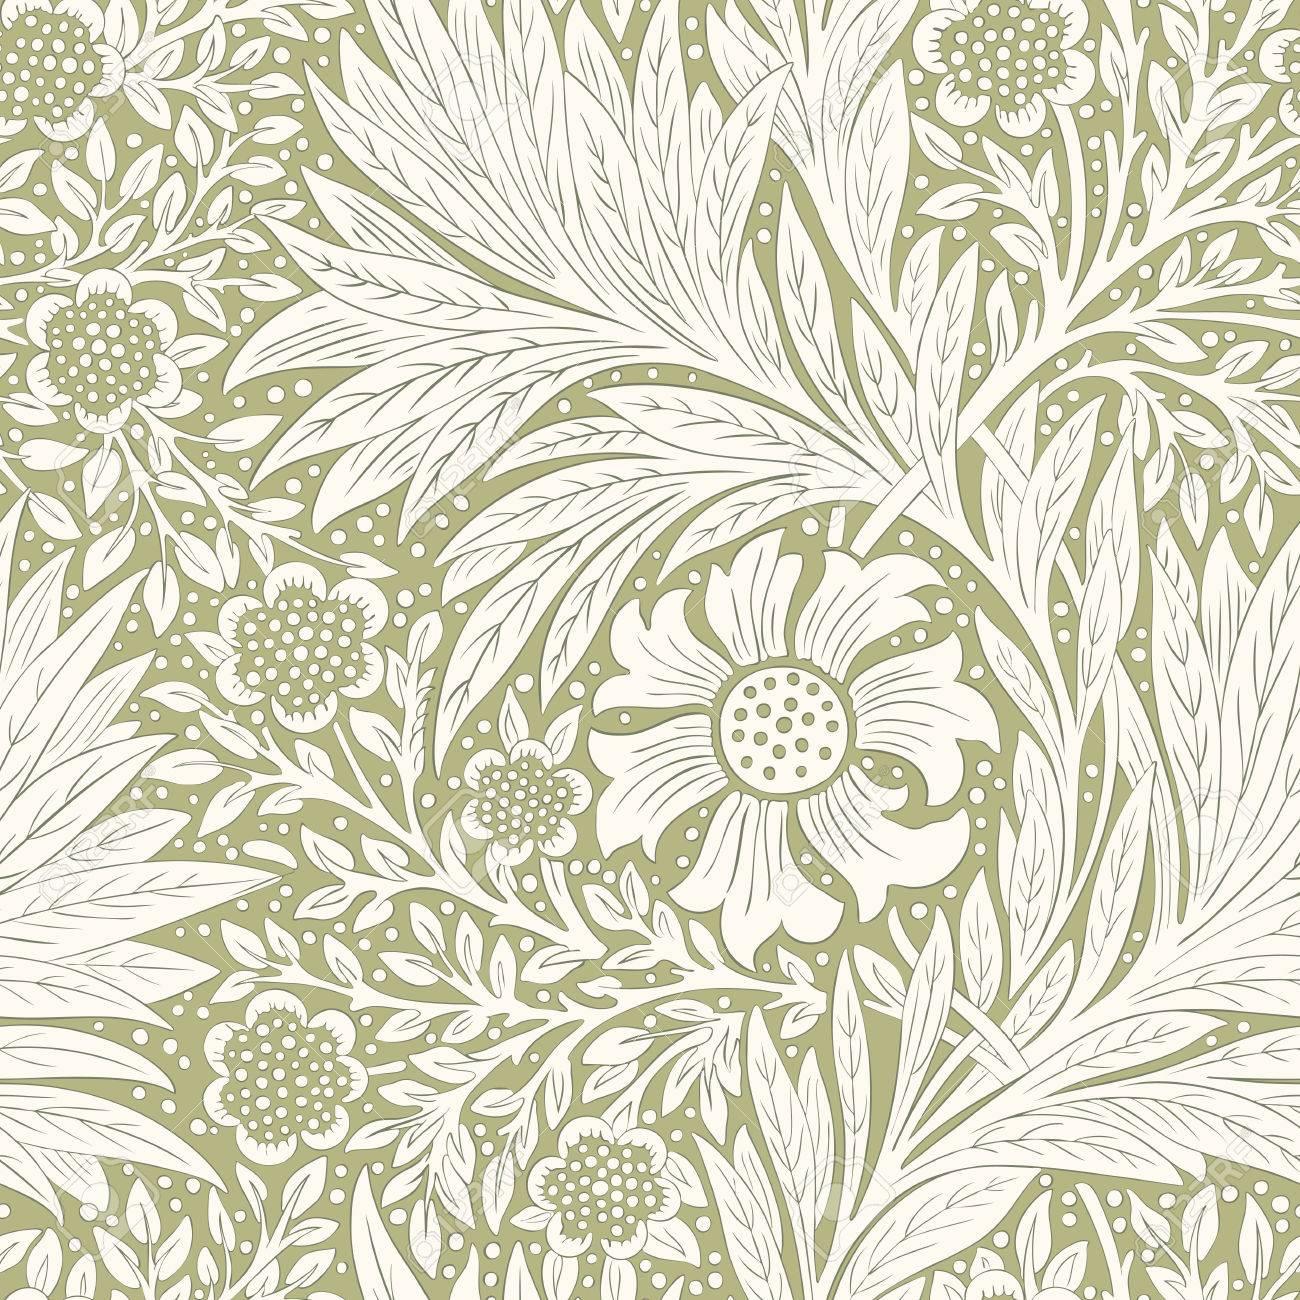 floral pattern for your design illustration modern seamless rh 123rf com